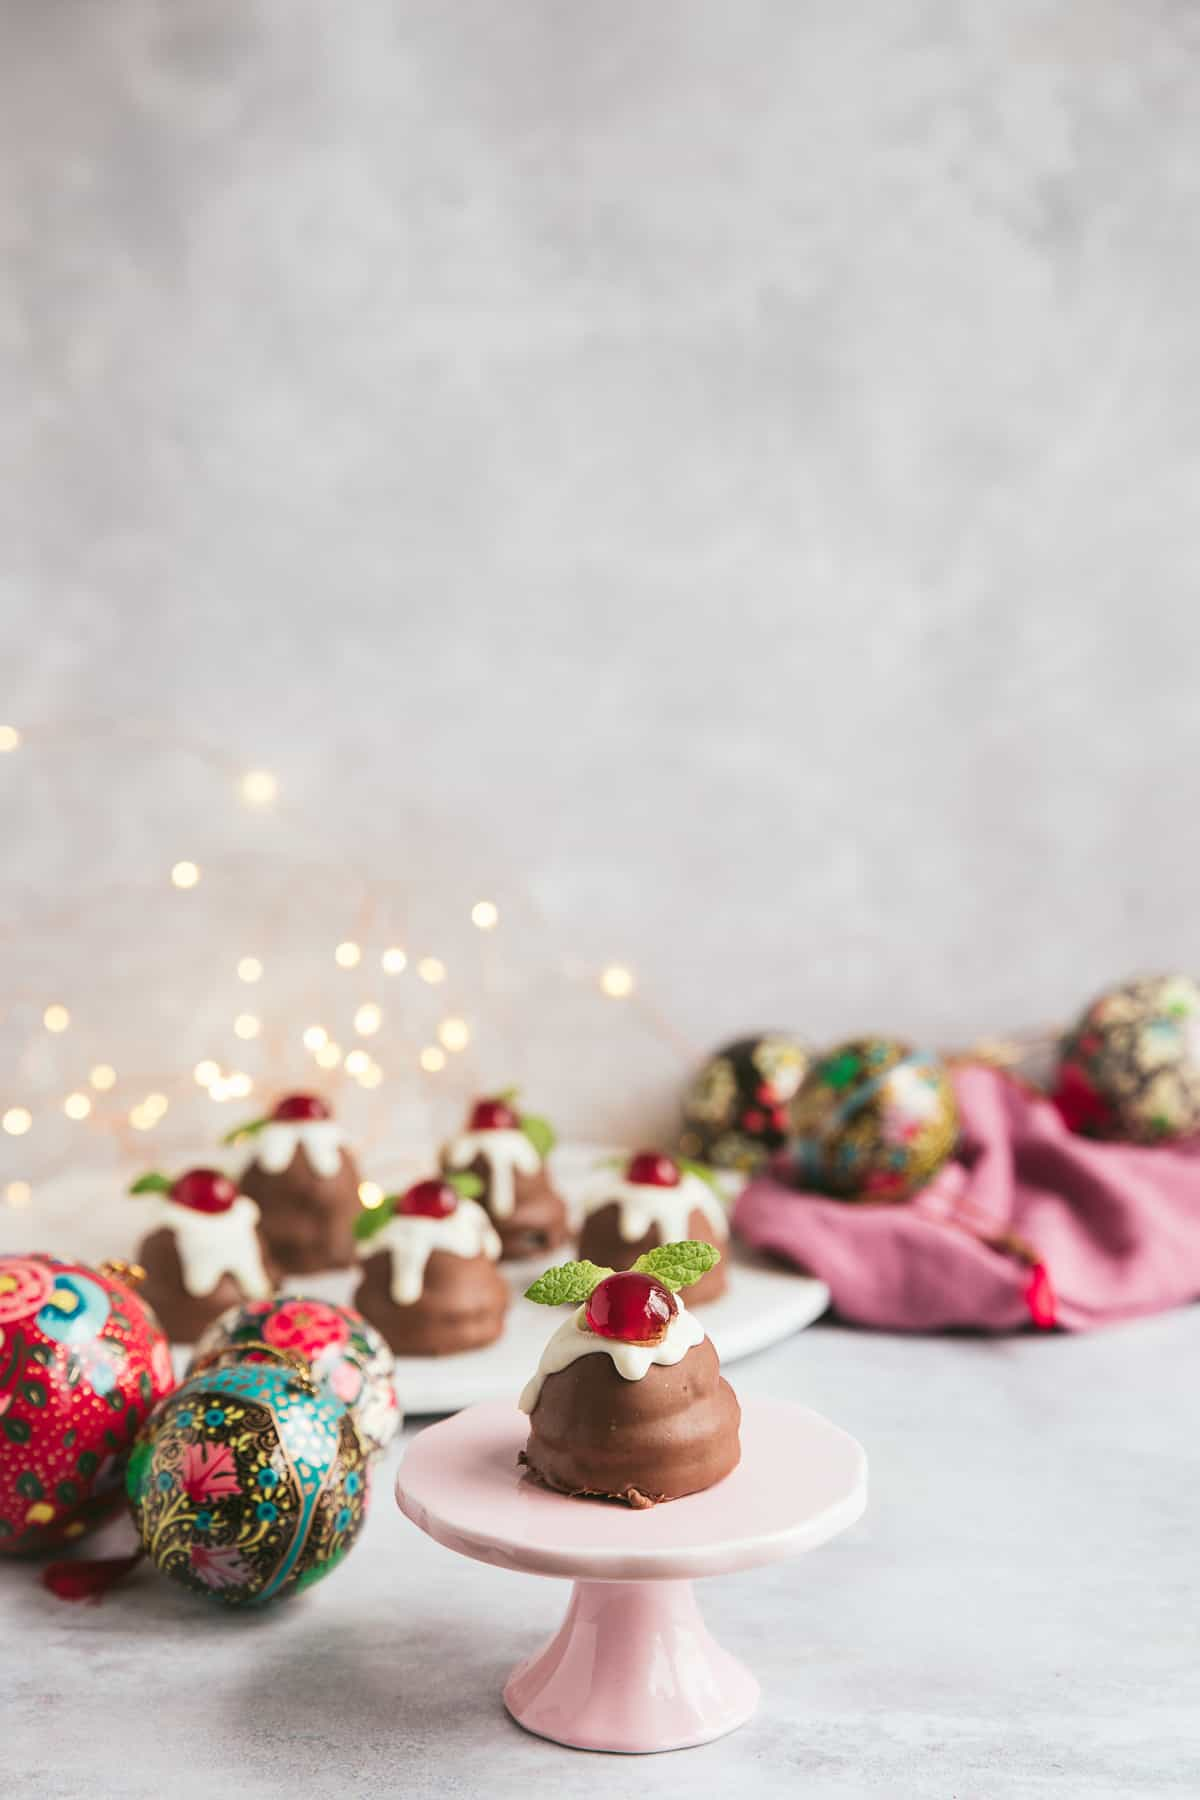 Mini vegan Christmas Puddings in a festive scene.